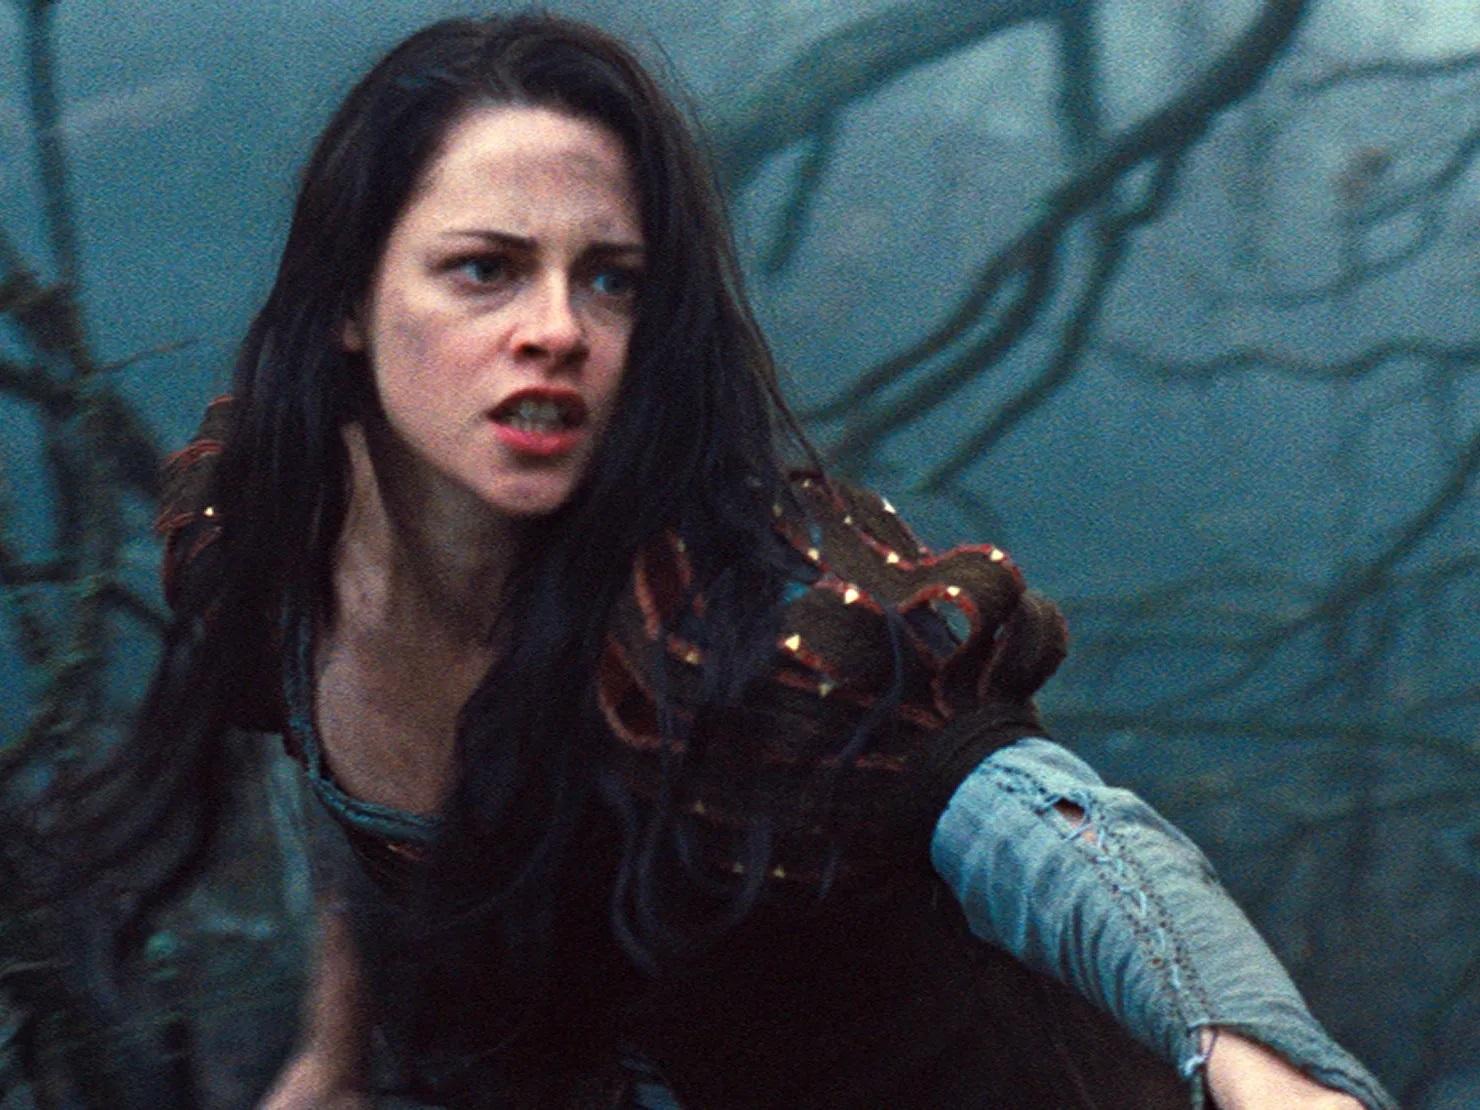 Snow White and the Huntsman kristen stewart filmleri listelist